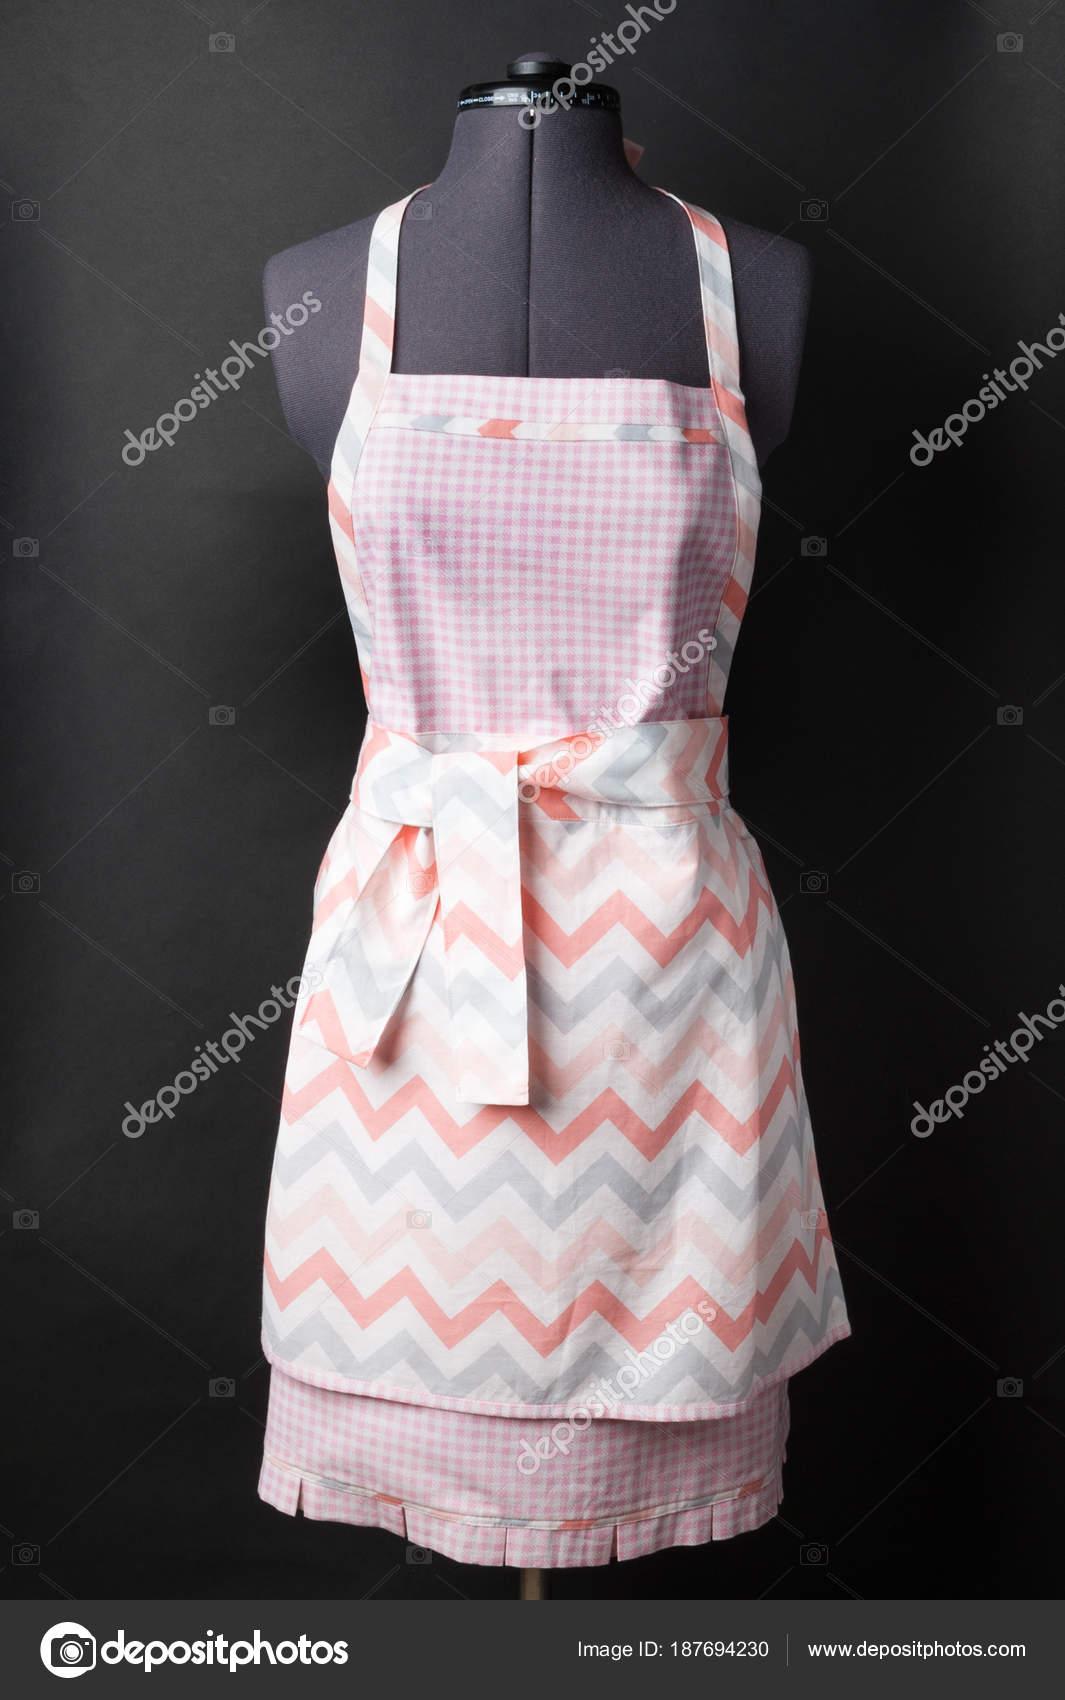 kitchen aprons aid gas grill 黑色厨房围裙 图库照片 c garry518 187694230 女性厨房围裙在一个黑色背景的人体模特身上 照片作者garry518